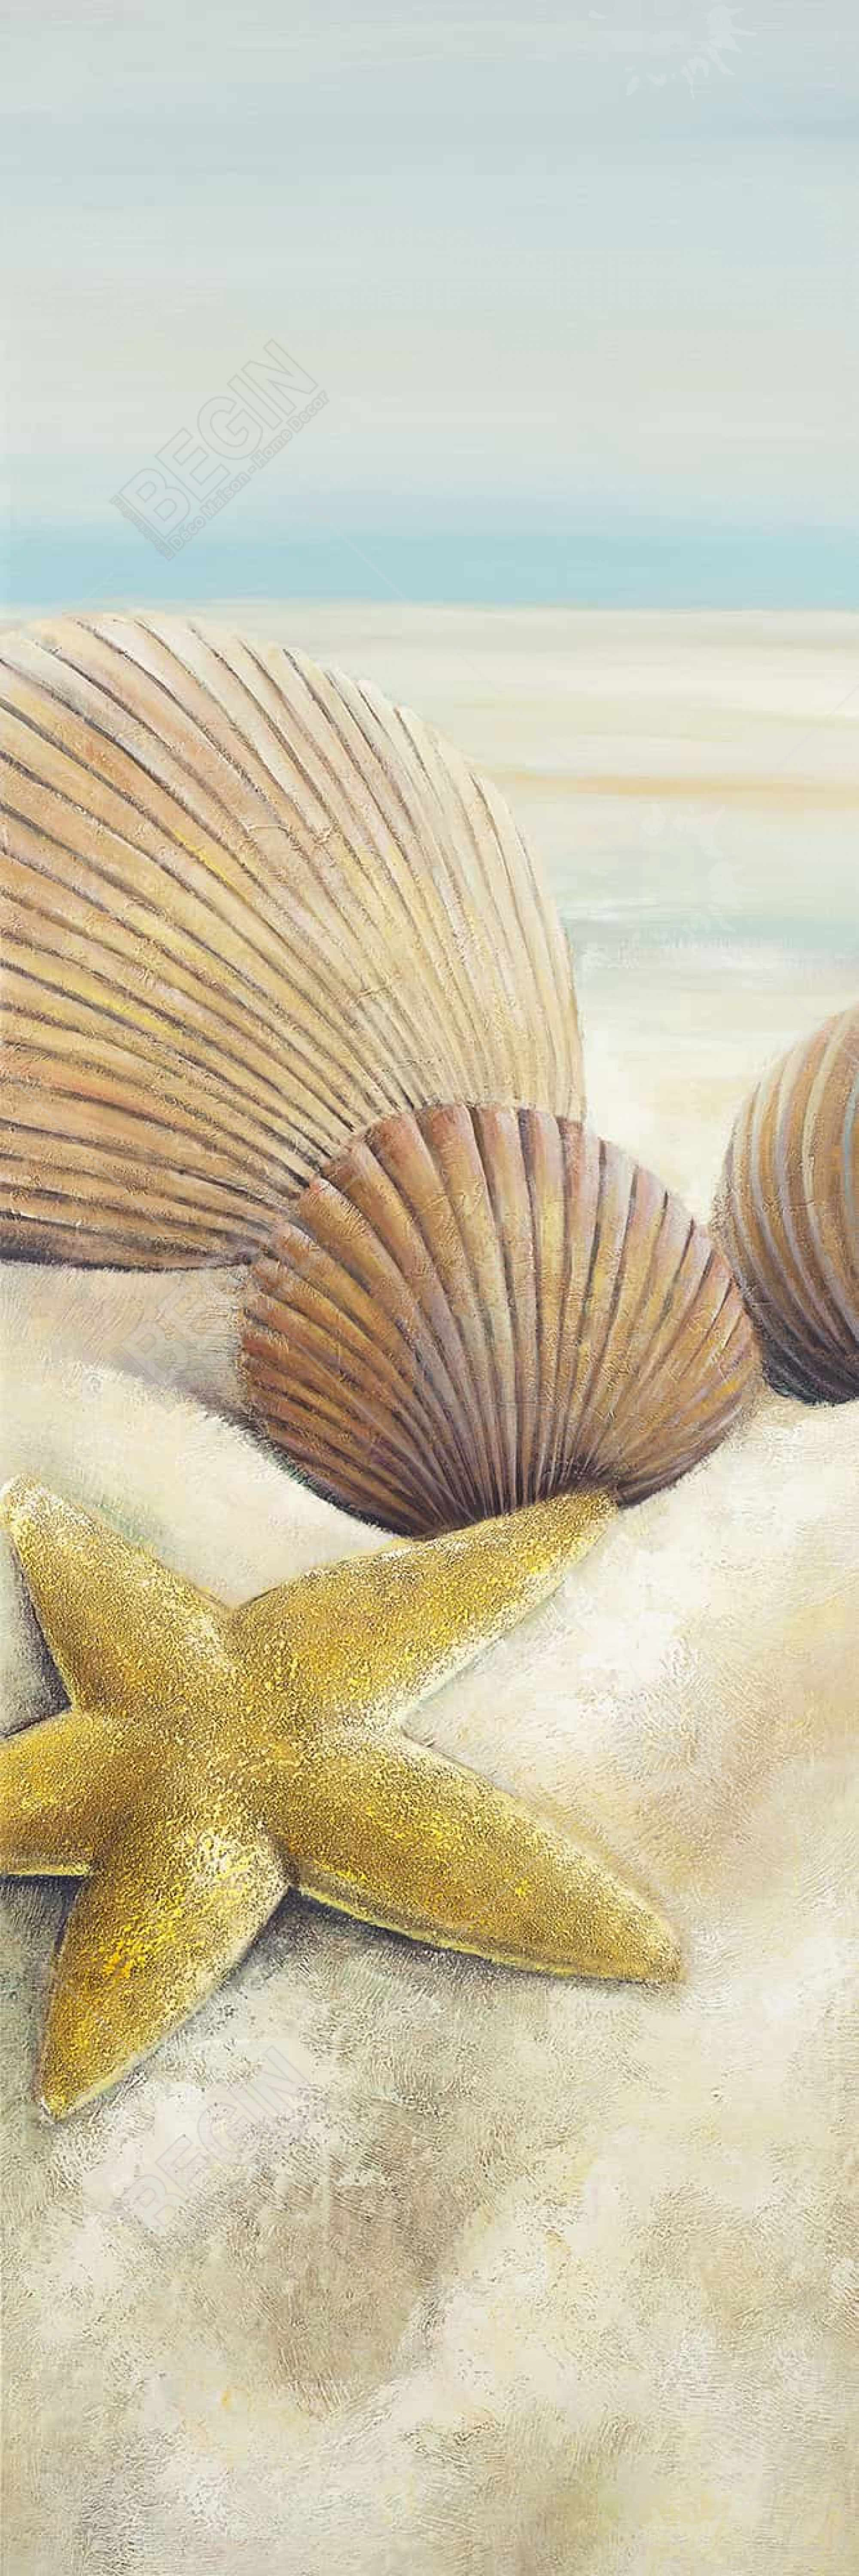 Starfish and seashells view on the beach